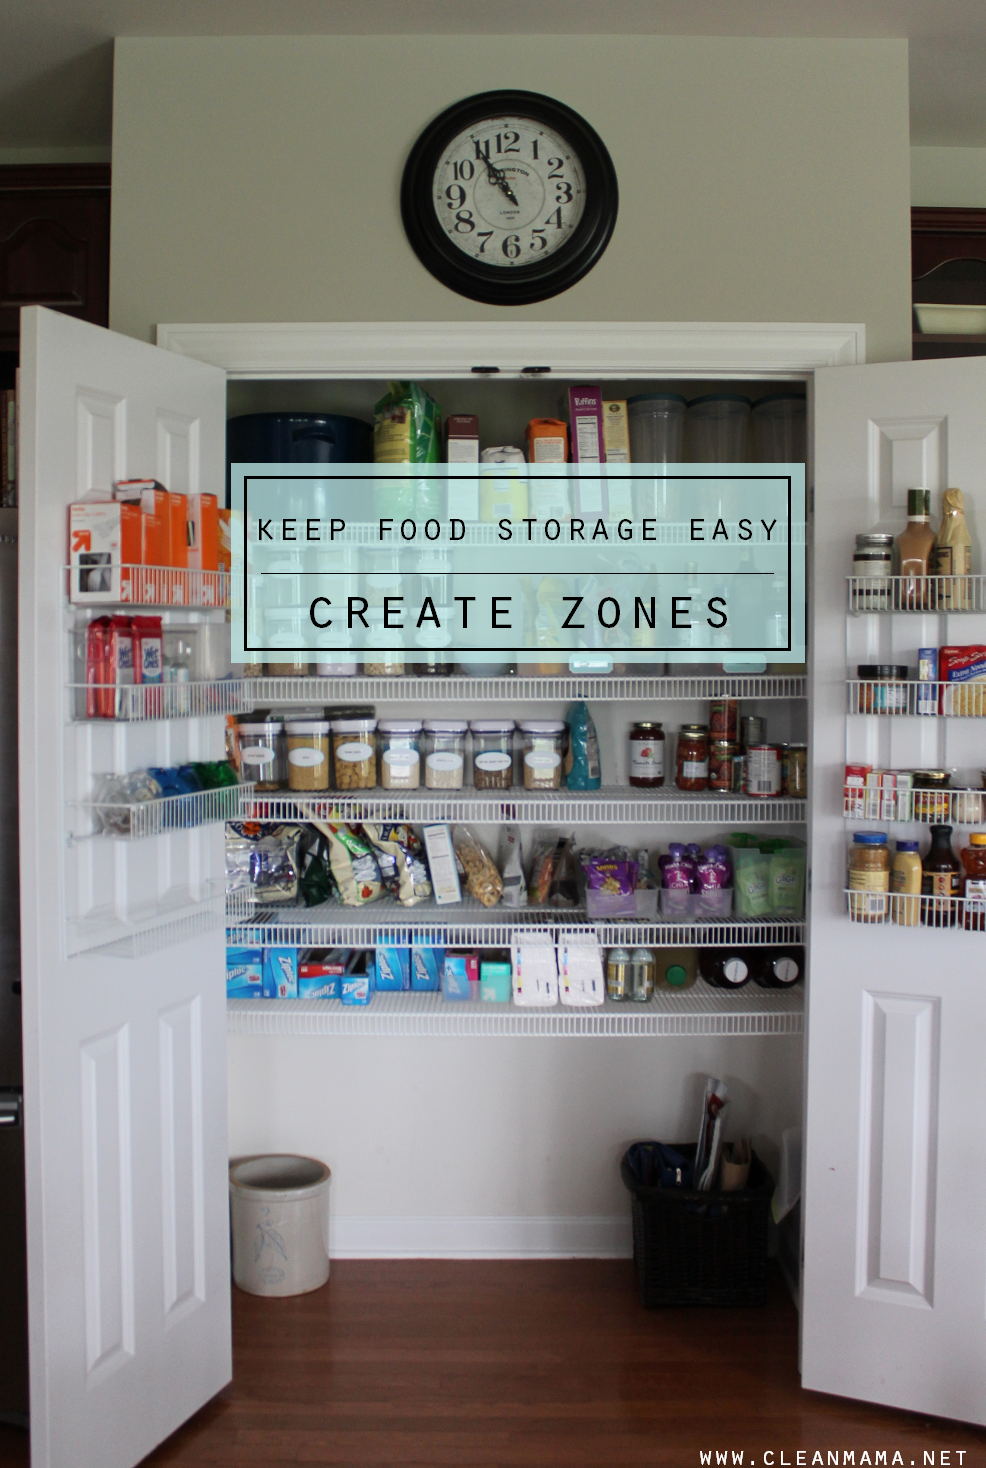 Keep Food Storage Easy - Create Zones | Food storage, Clean mama and ...